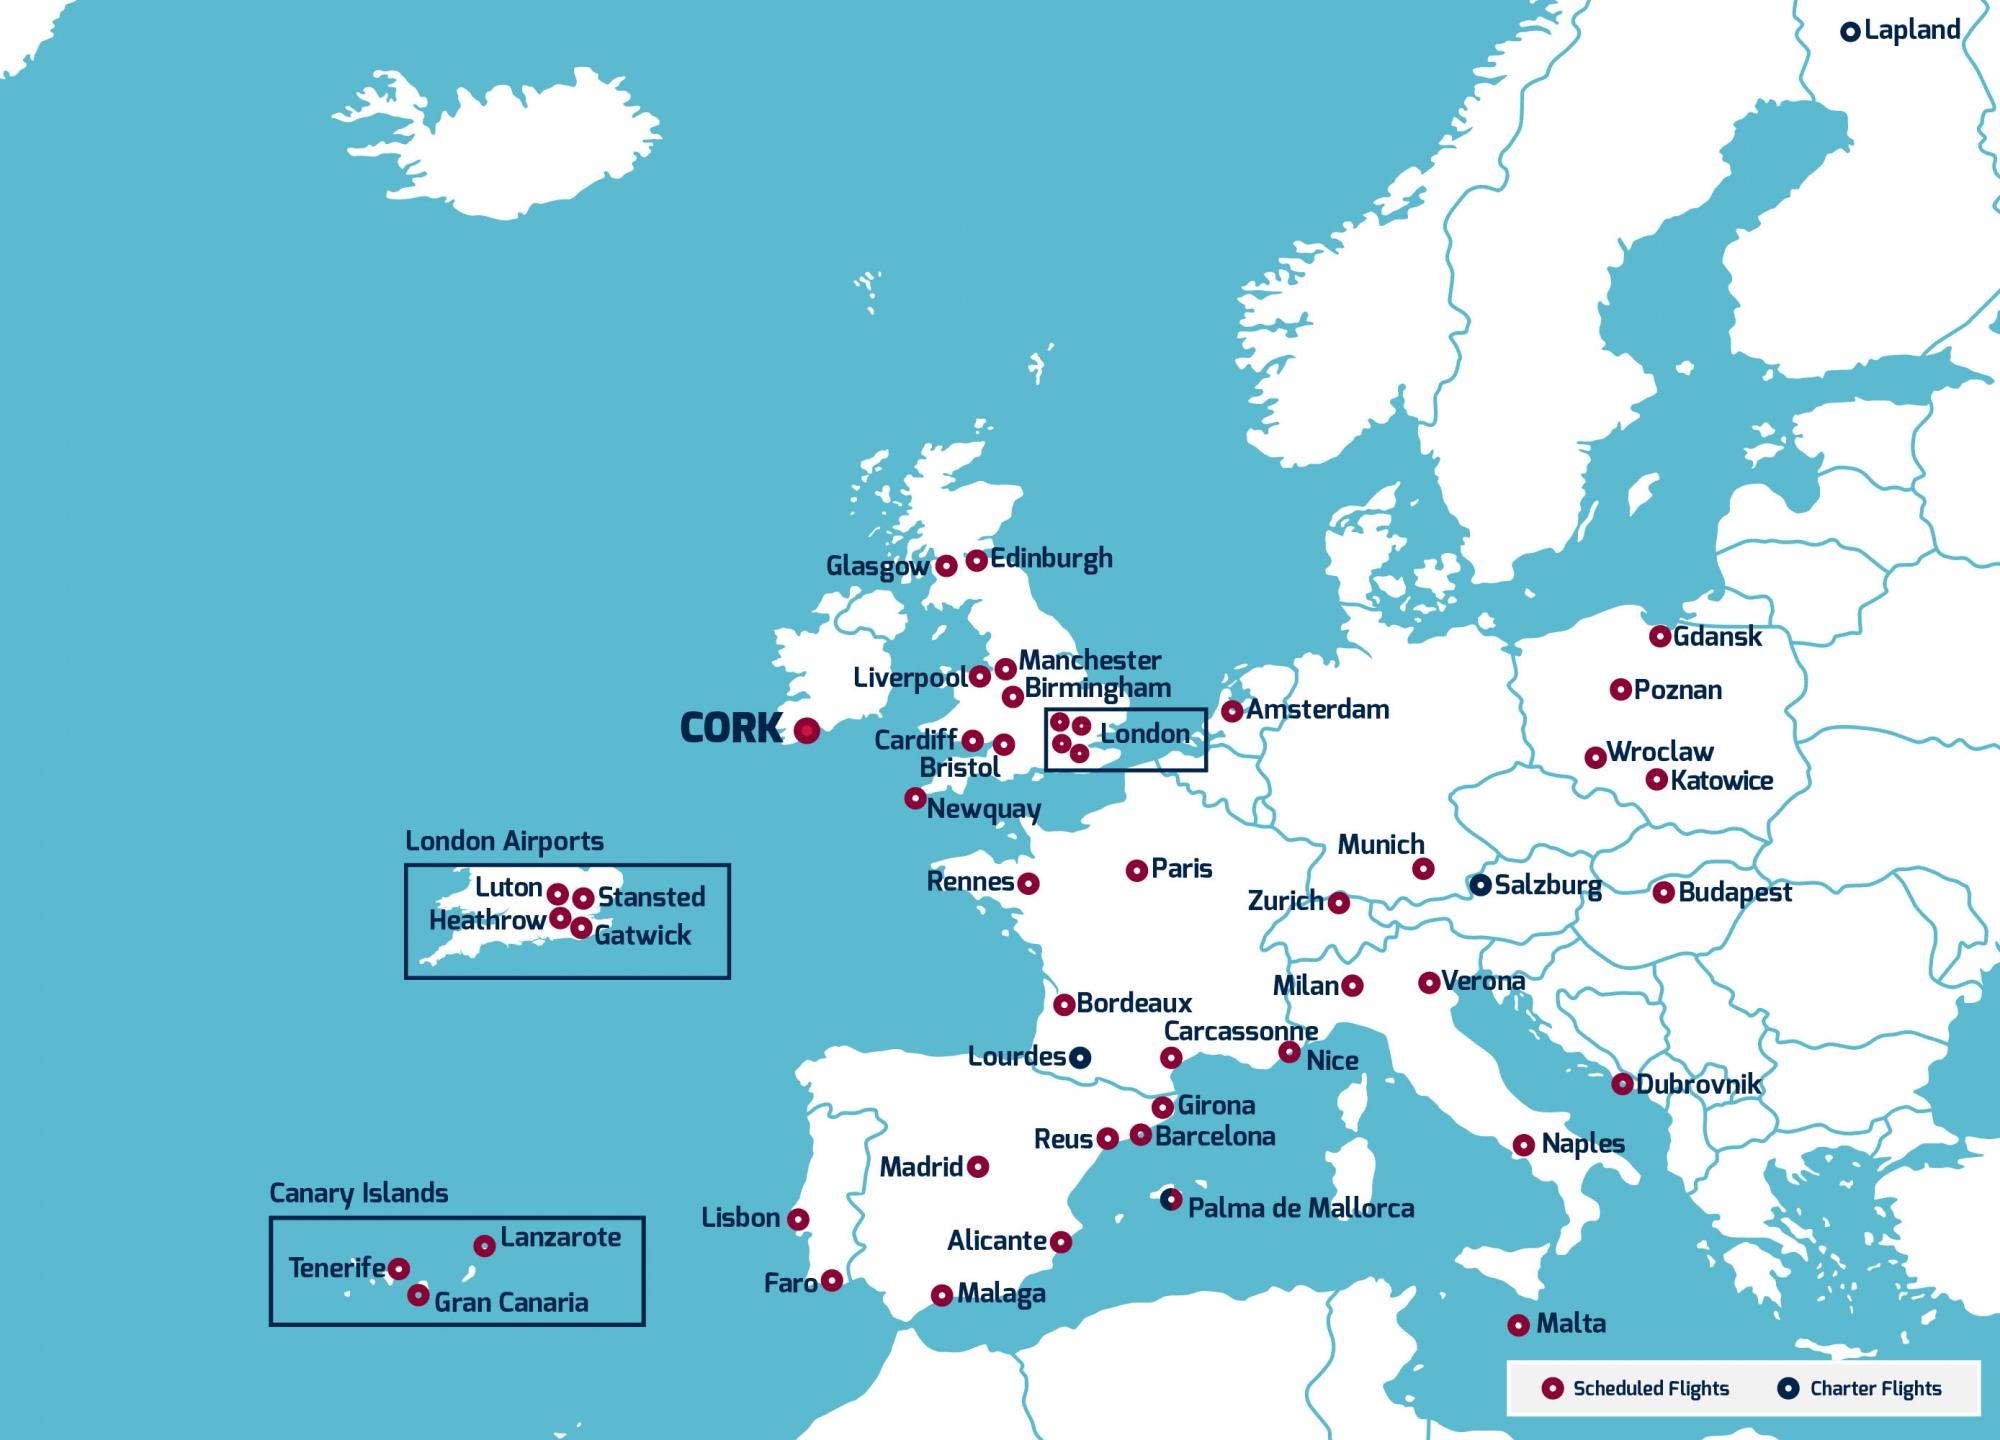 cork route map june 6